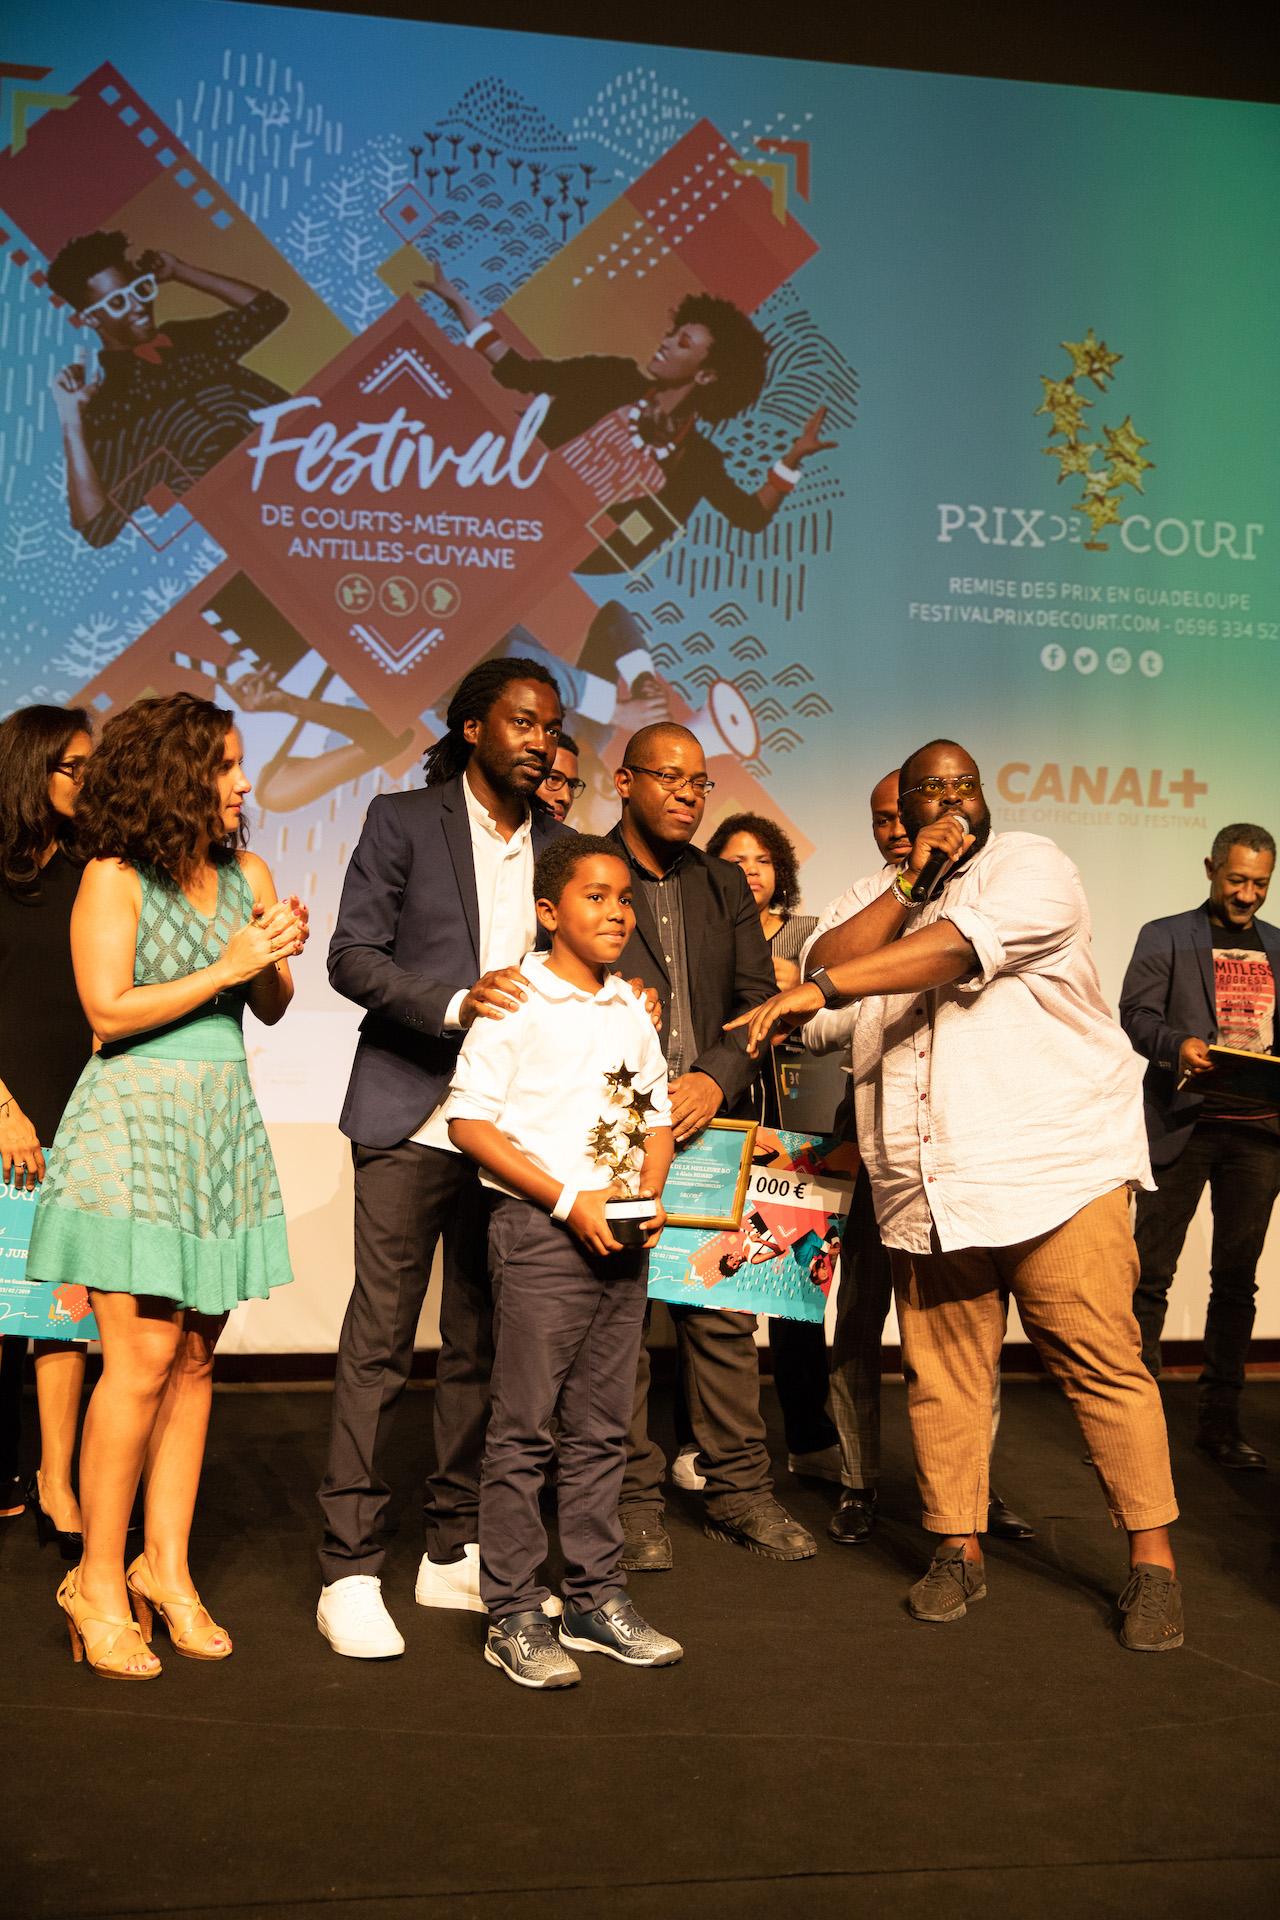 festivalPrixDeCourt-158